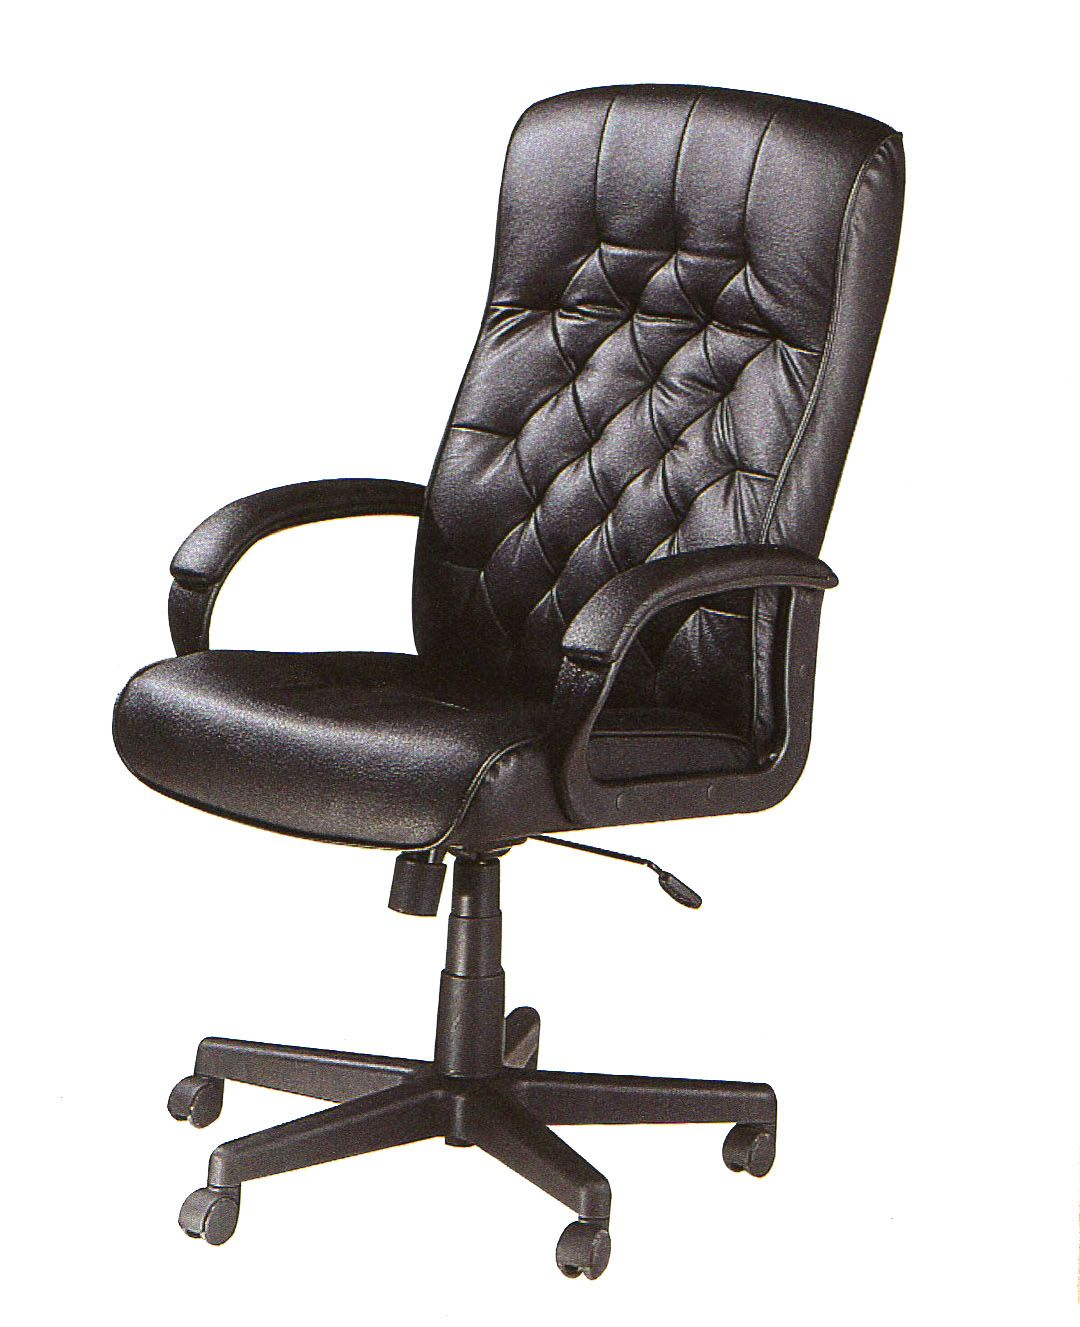 Genial Computerstuhl Beste Wahl Puter Stuhl